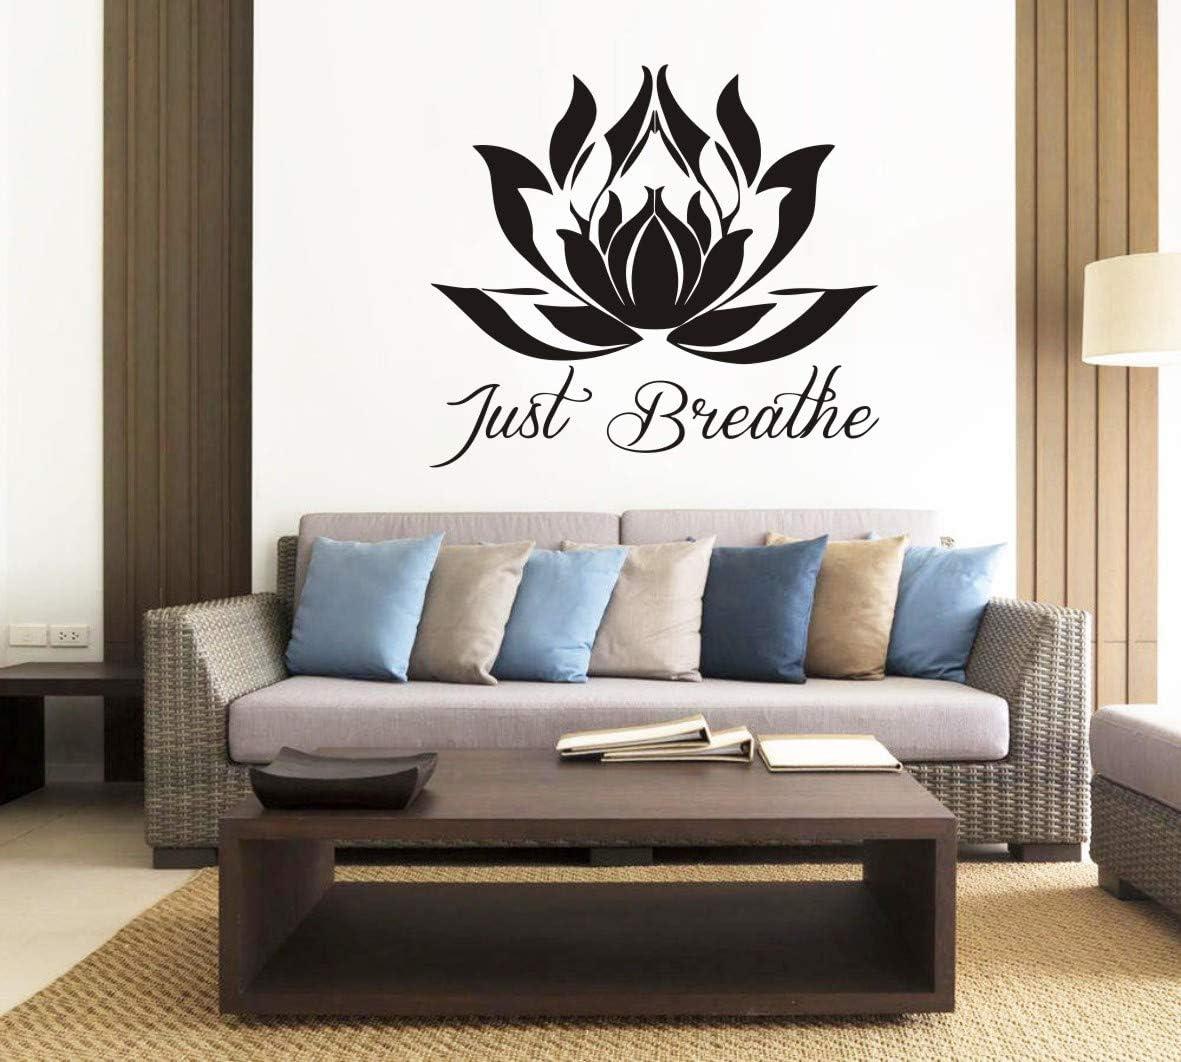 Amazon Com Home Decoration Lotus Flower Wall Sticker Yoga Studio Namaste Om Mandala Meditation Wall Decor Home Living Room Bedroom Wall Art Sticker Yoga Room Decor Mural Syy797 Black Arts Crafts Sewing